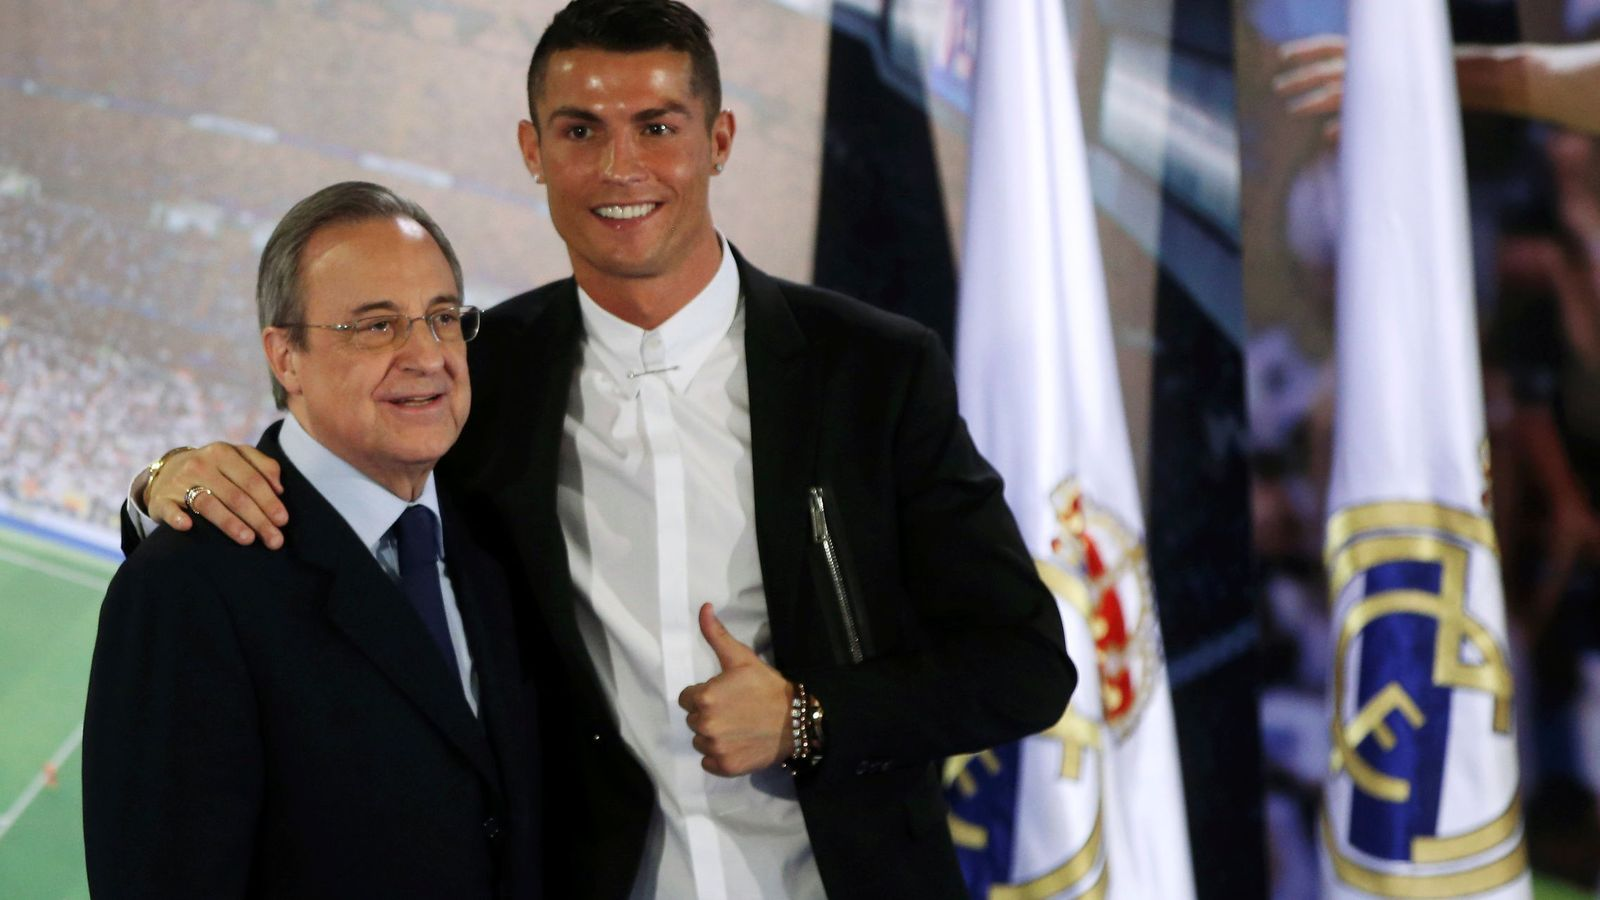 Foto: En la imagen, Florentino Pérez junto a Cristiano Ronaldo. (Reuters)